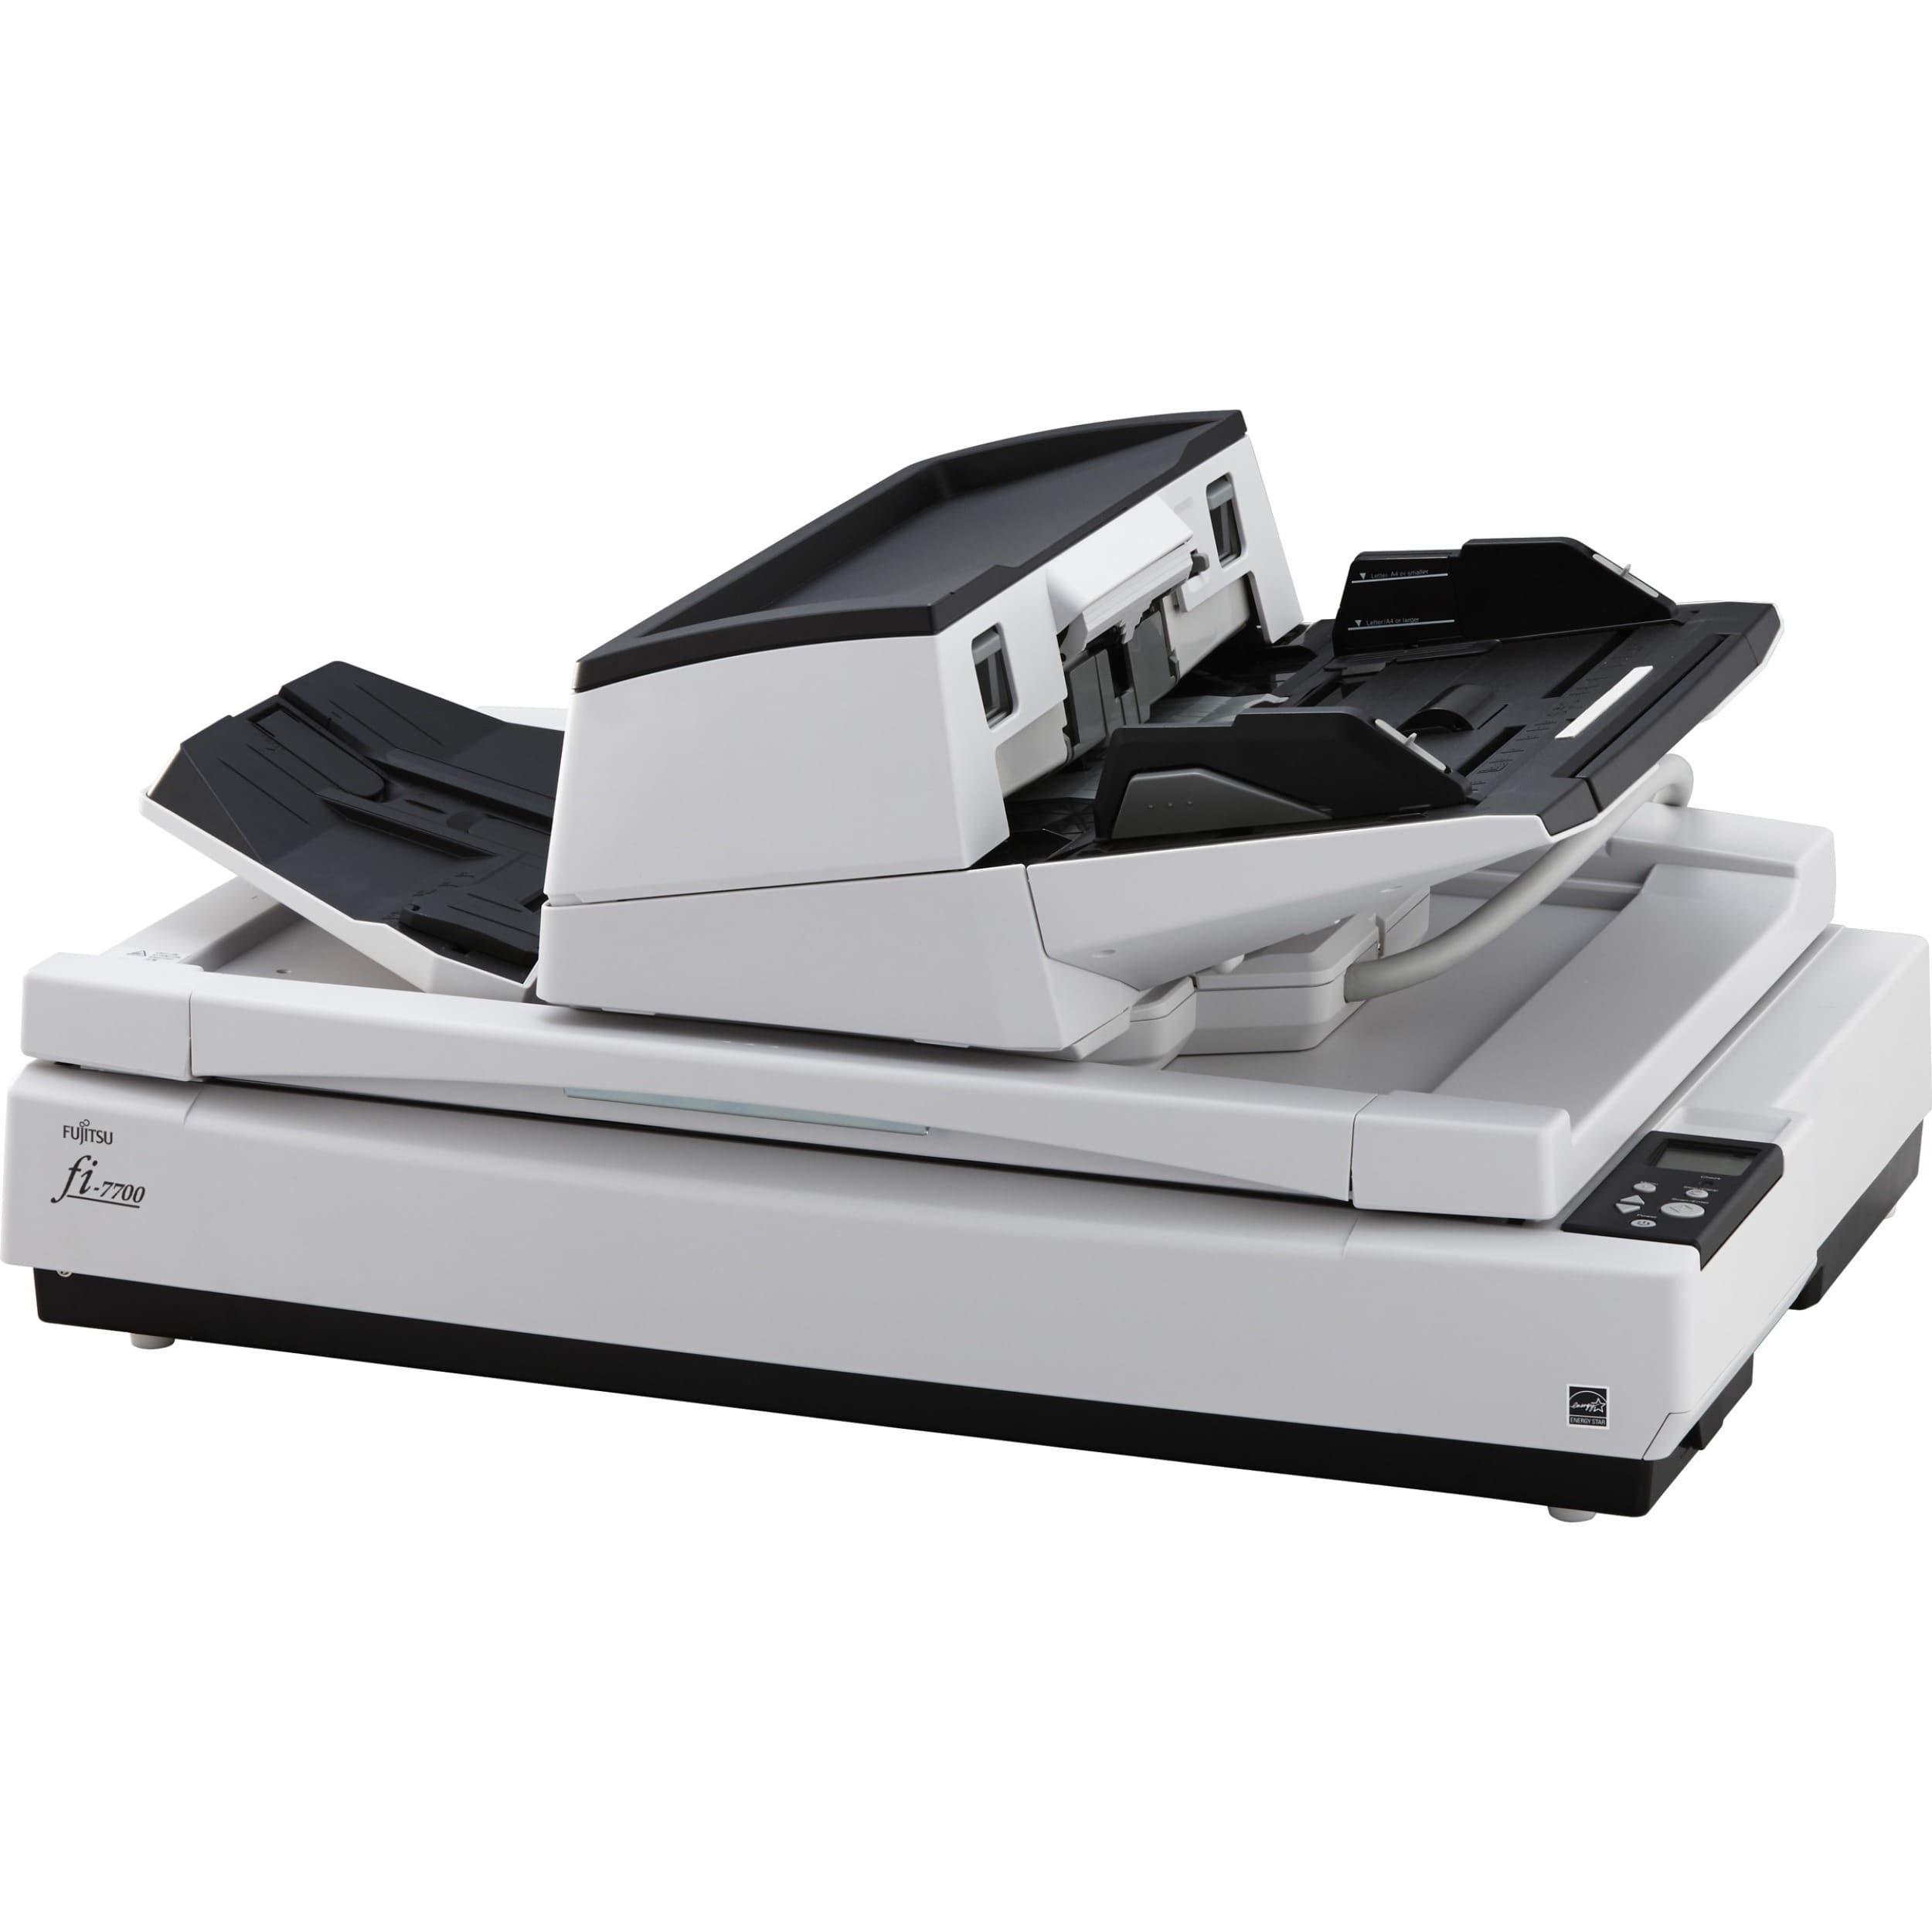 Fujitsu Fi 7700 Sheetfed Flatbed Scanner 600 Dpi Optical Printer Scanner Copier Printer Scanner Cool Bluetooth Speakers